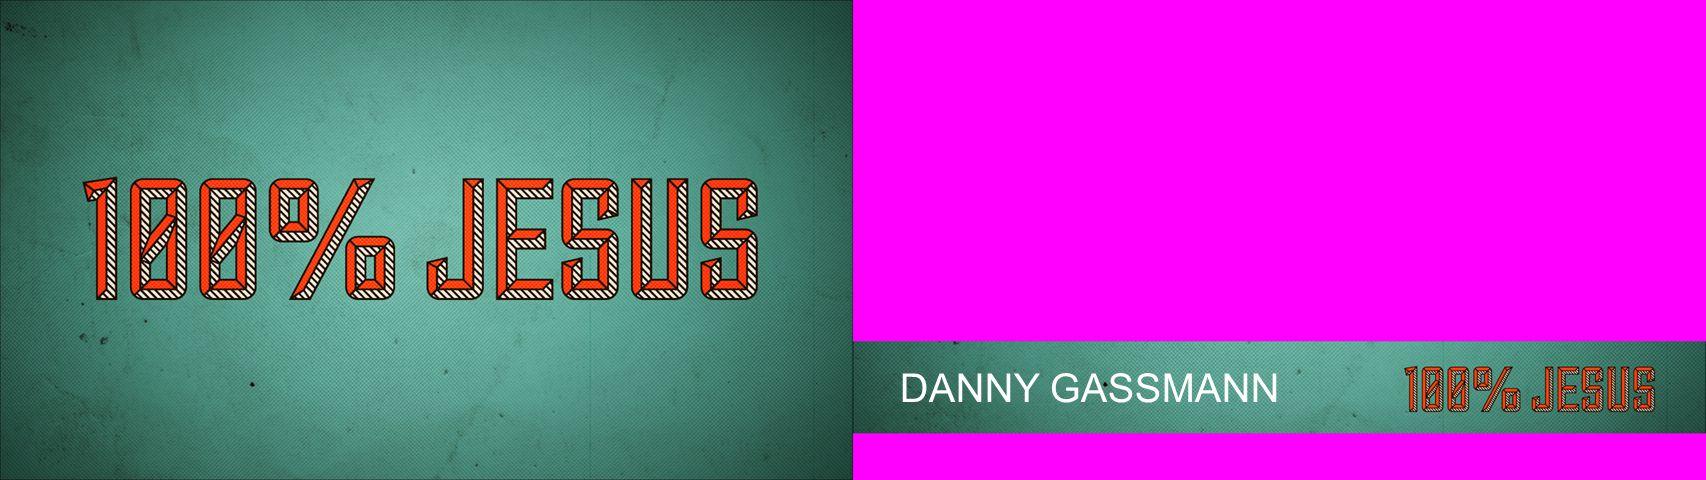 DANNY GASSMANN Serienlogo